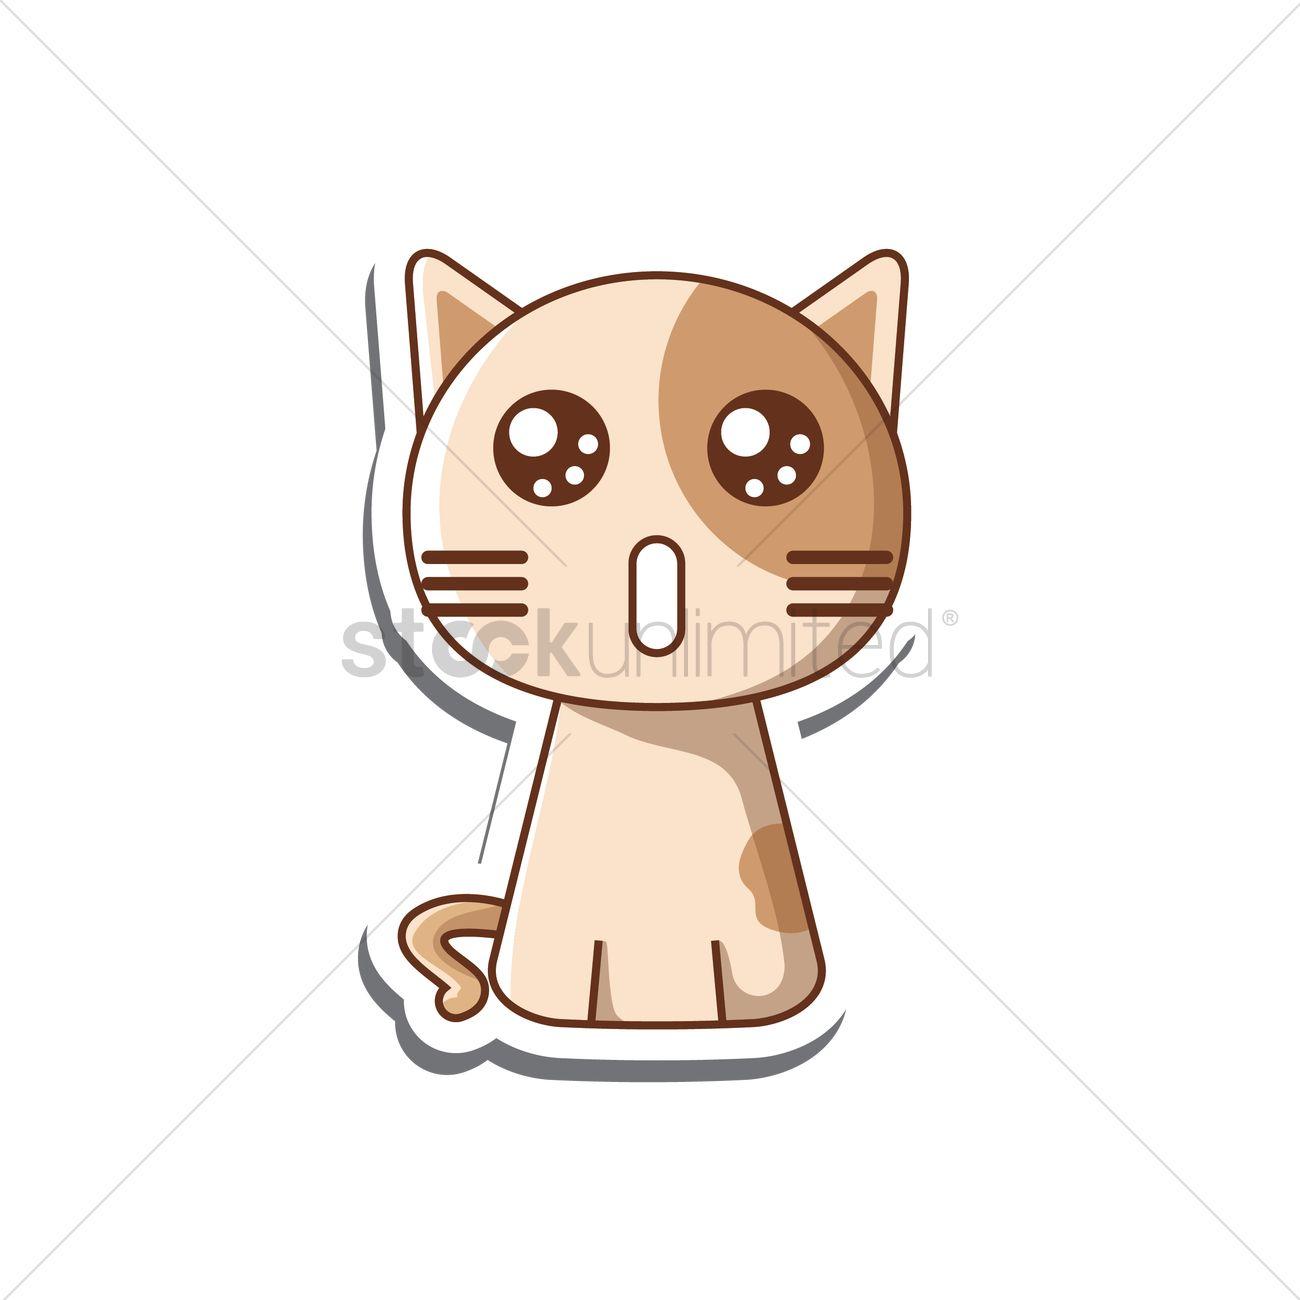 Free Surprised cat cartoon Vector Image.